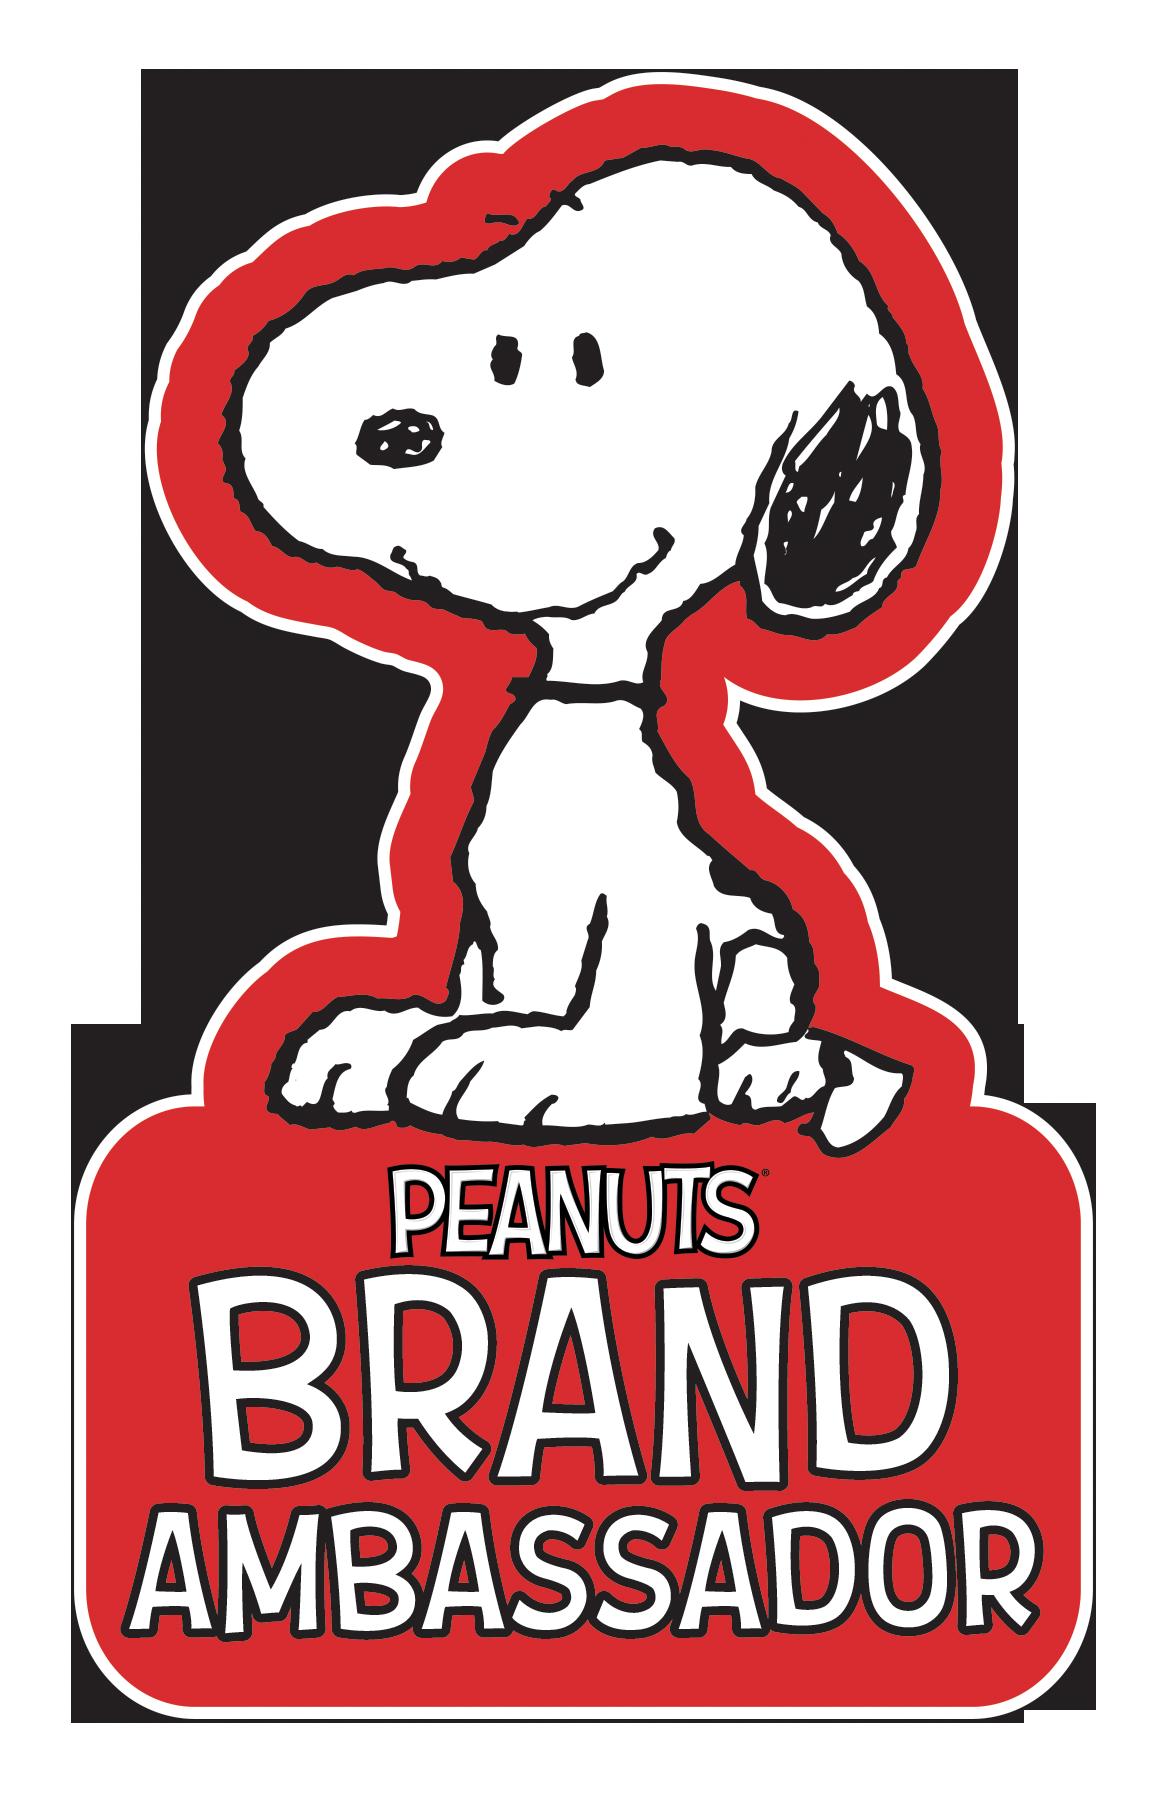 Peanuts Brand Ambassador Badge